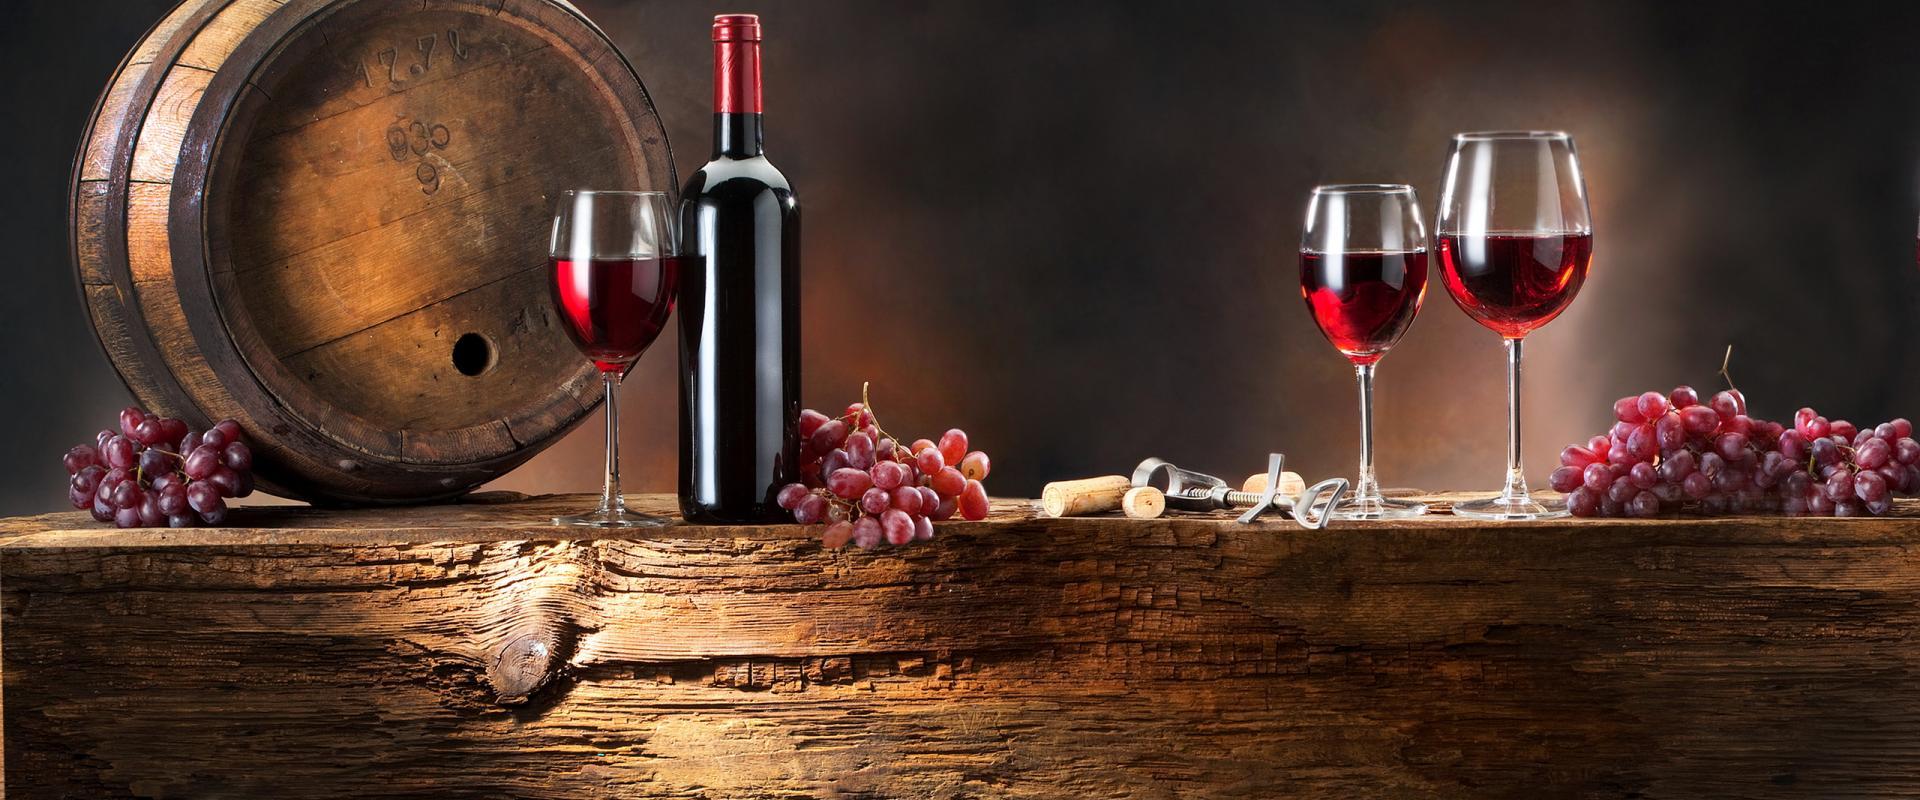 Wine tasting in medieval cellar